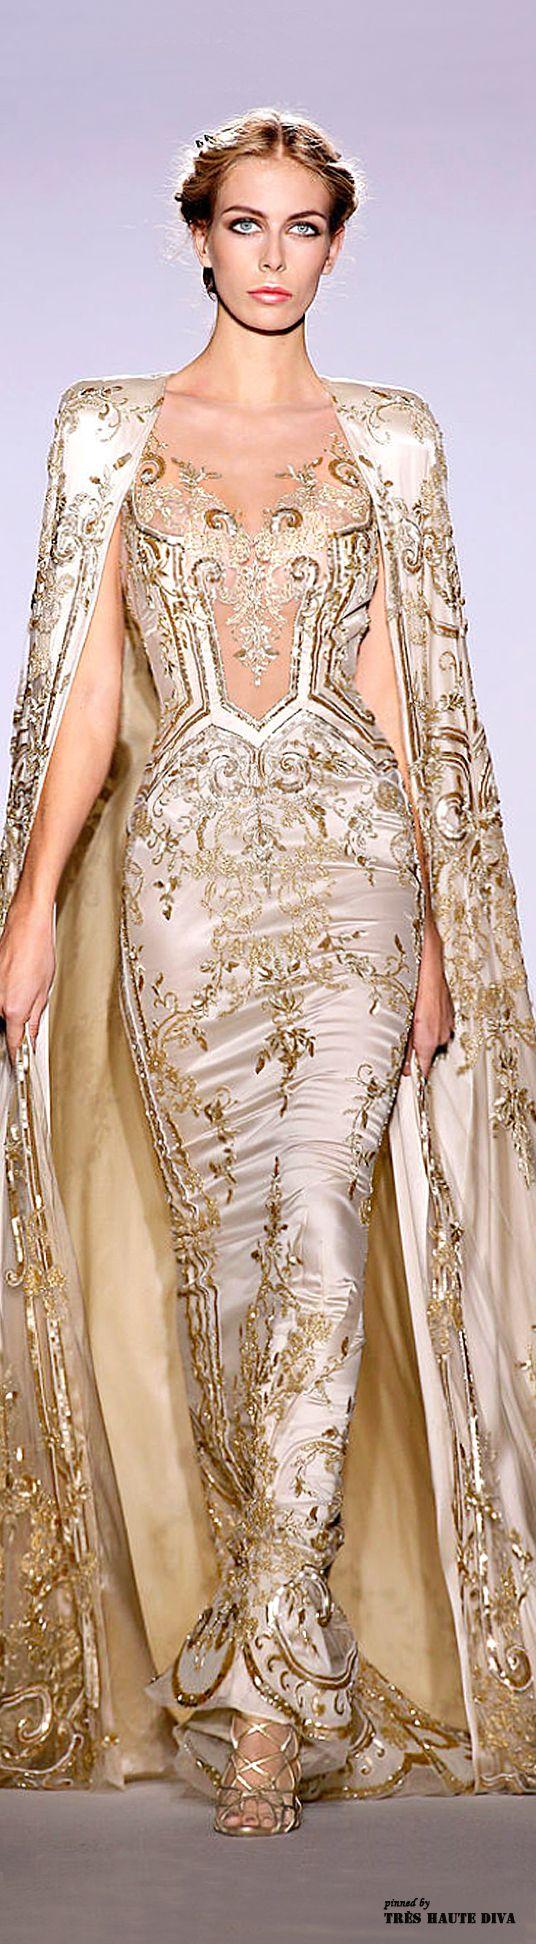 Zuhair Murad Spring/Summer 2013 Couture